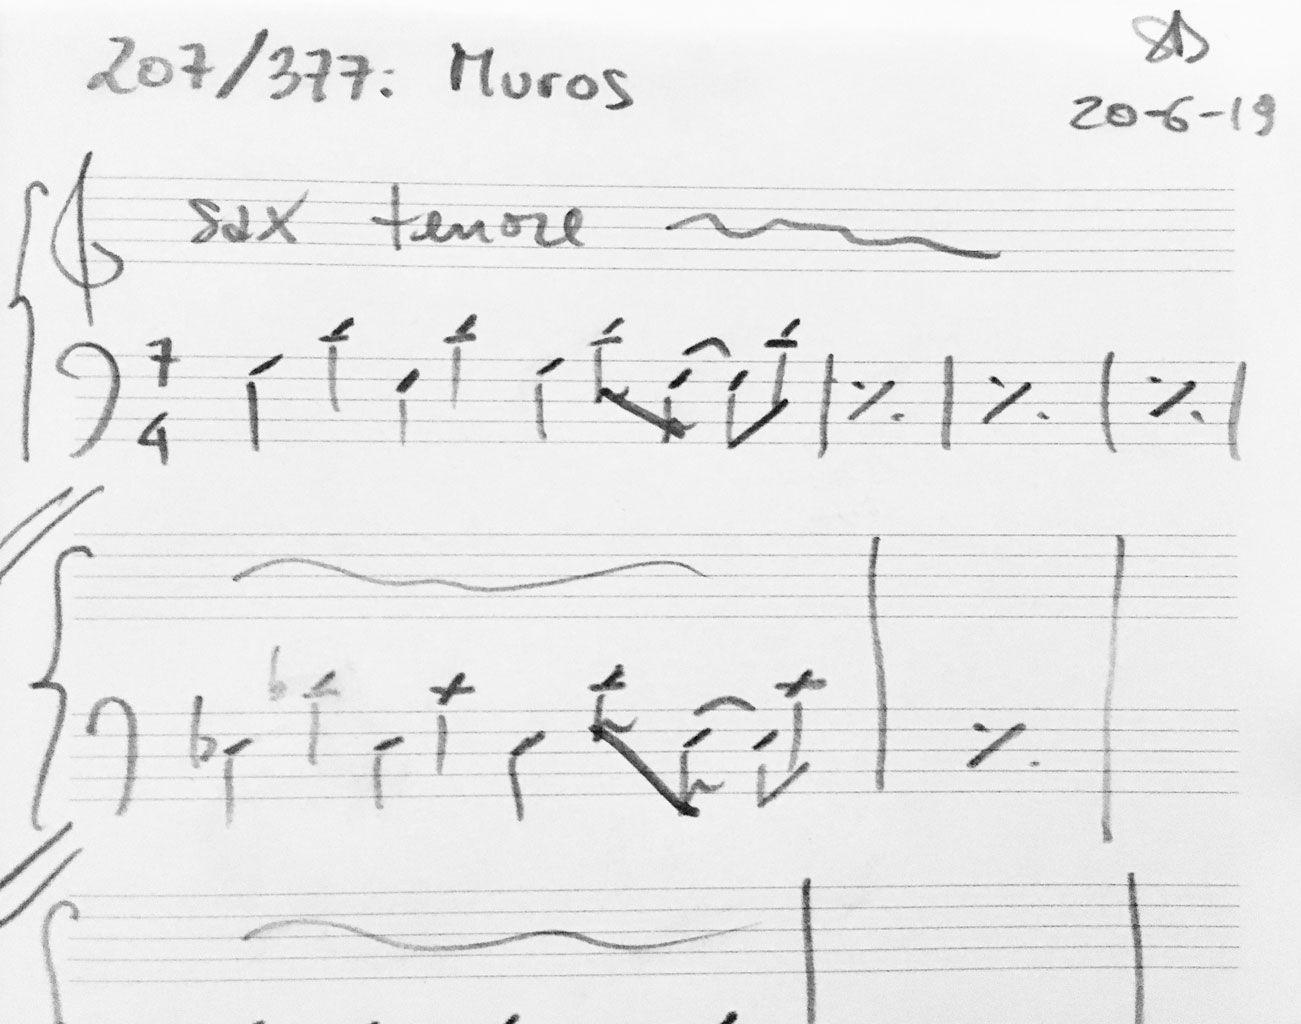 207-Muros-score